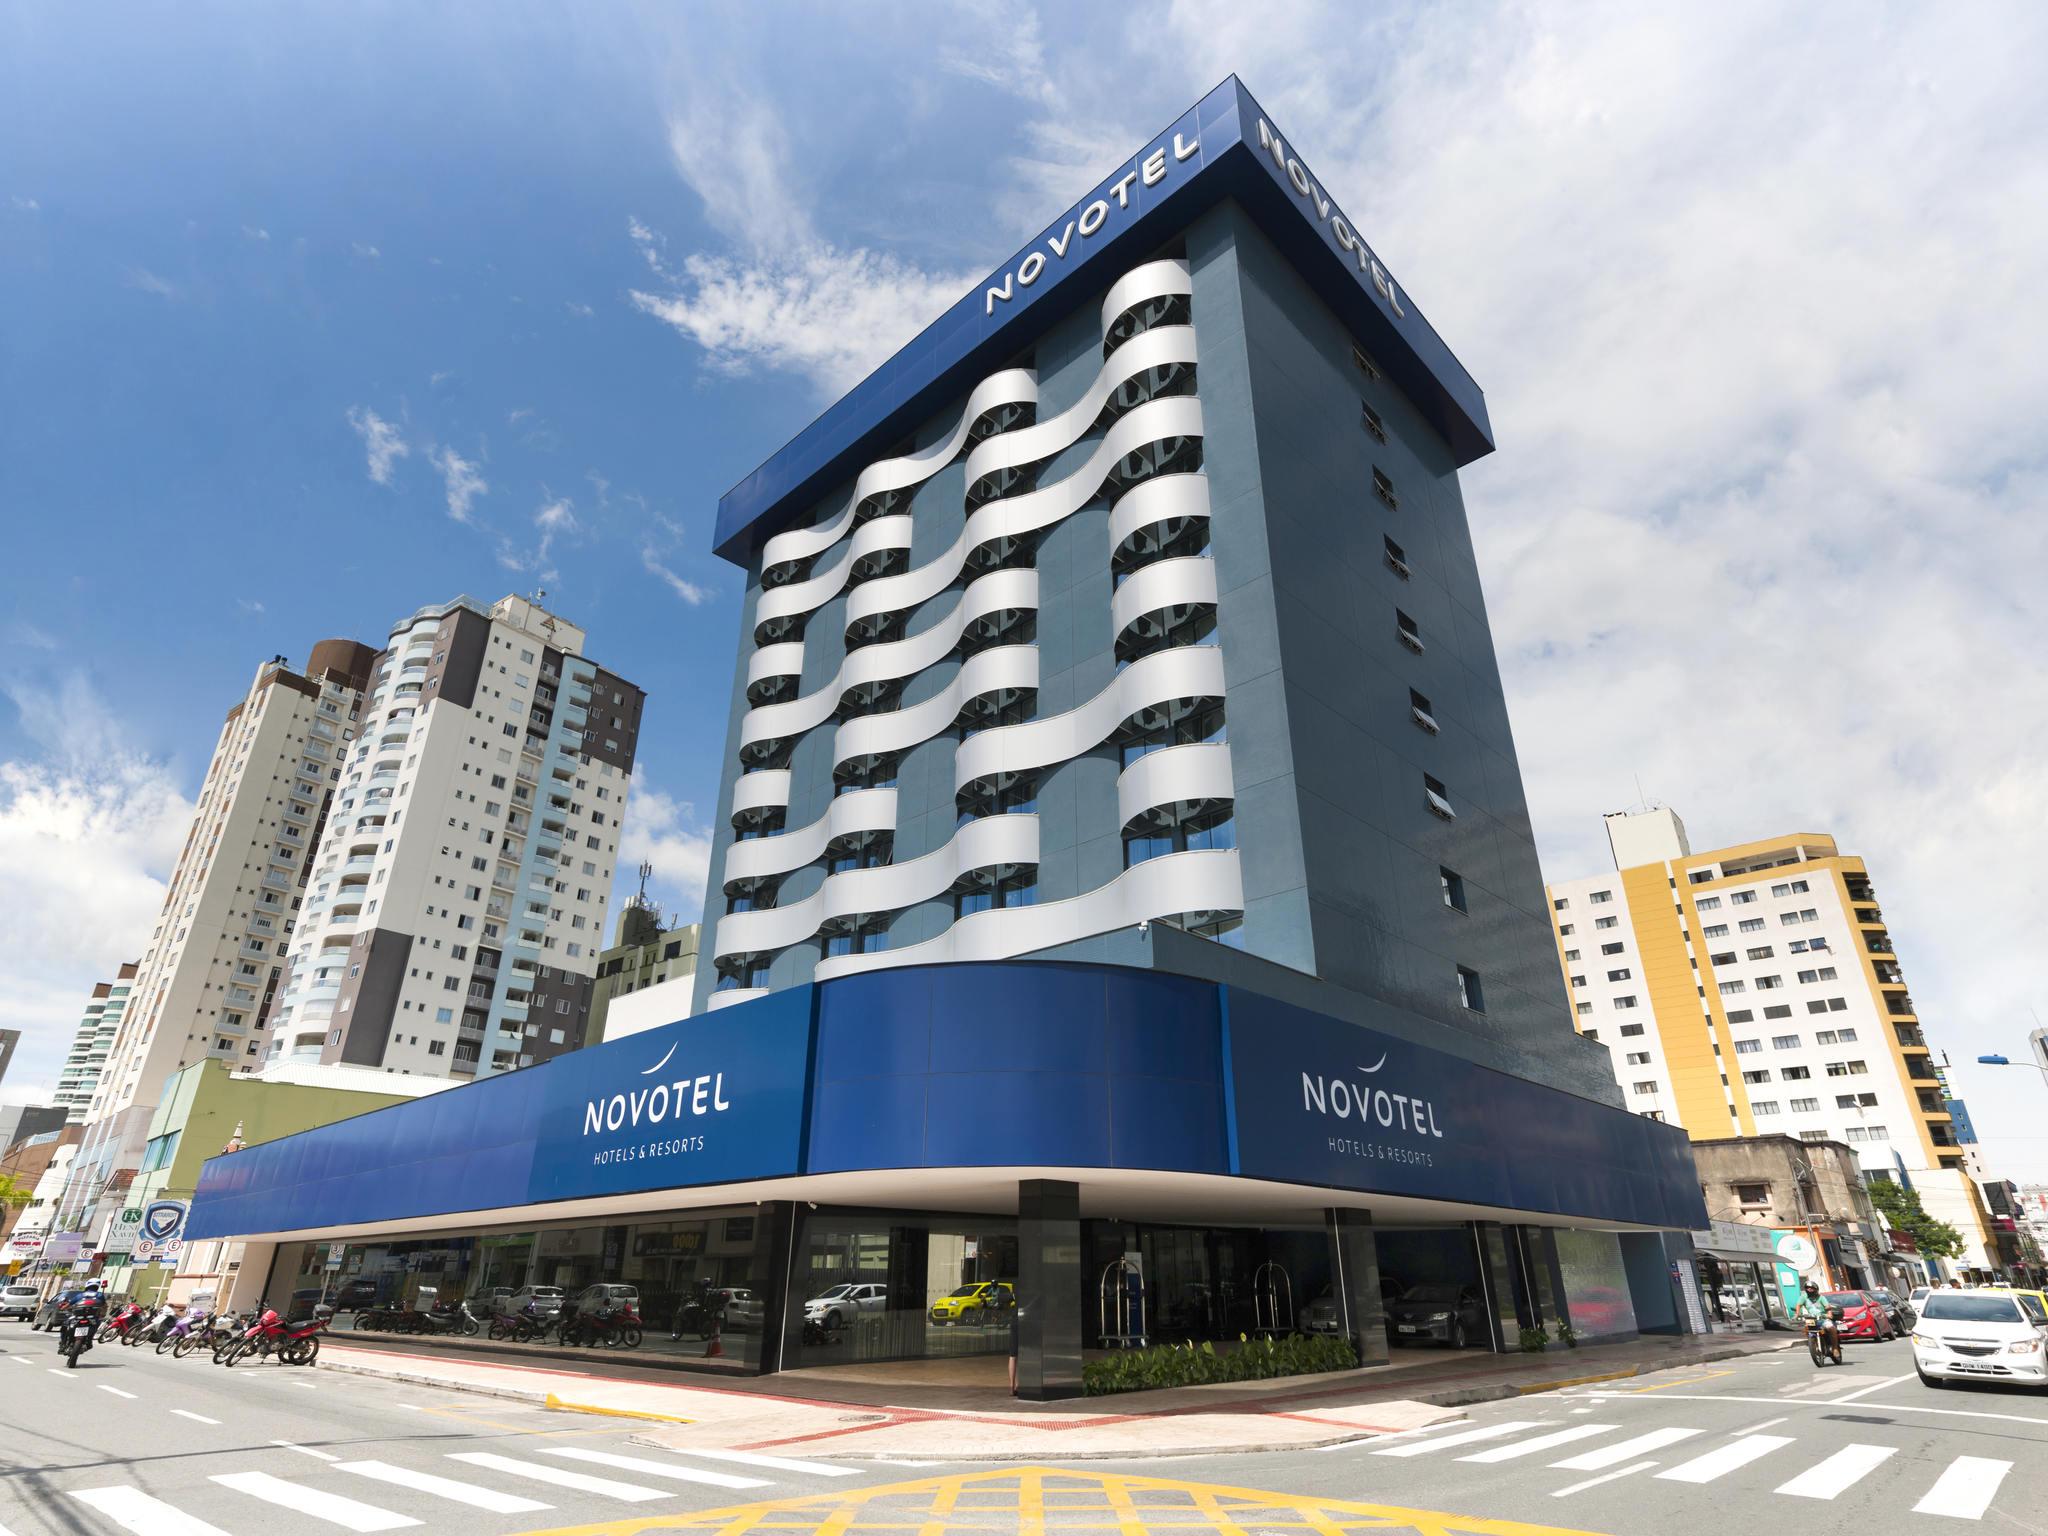 Hotel - Novotel Itajaí (abre em dezembro de 2017)